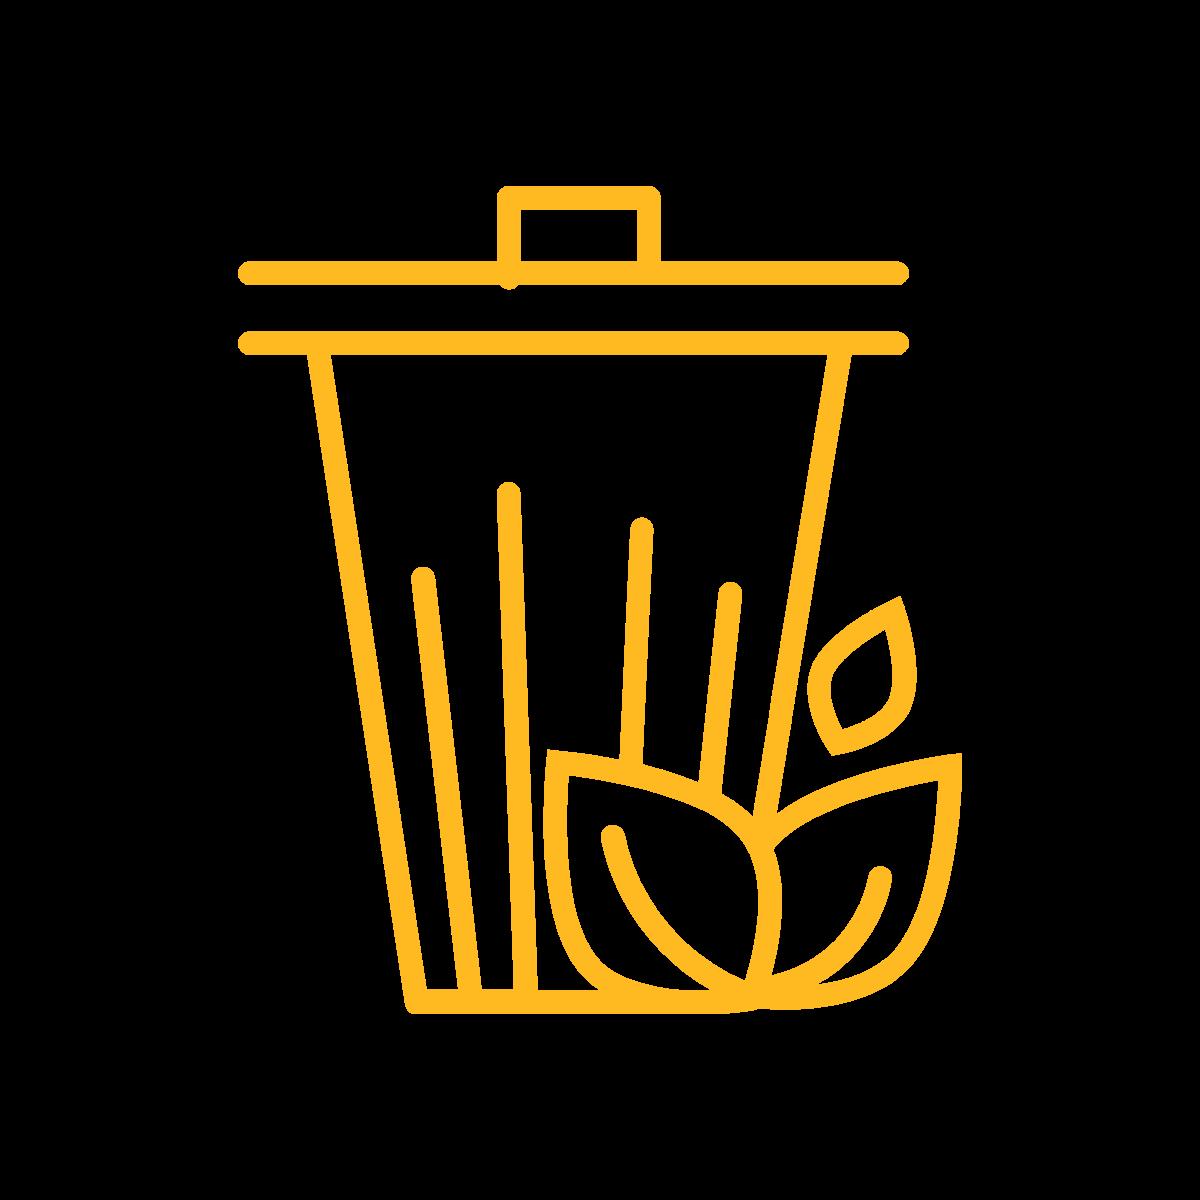 green waste icon